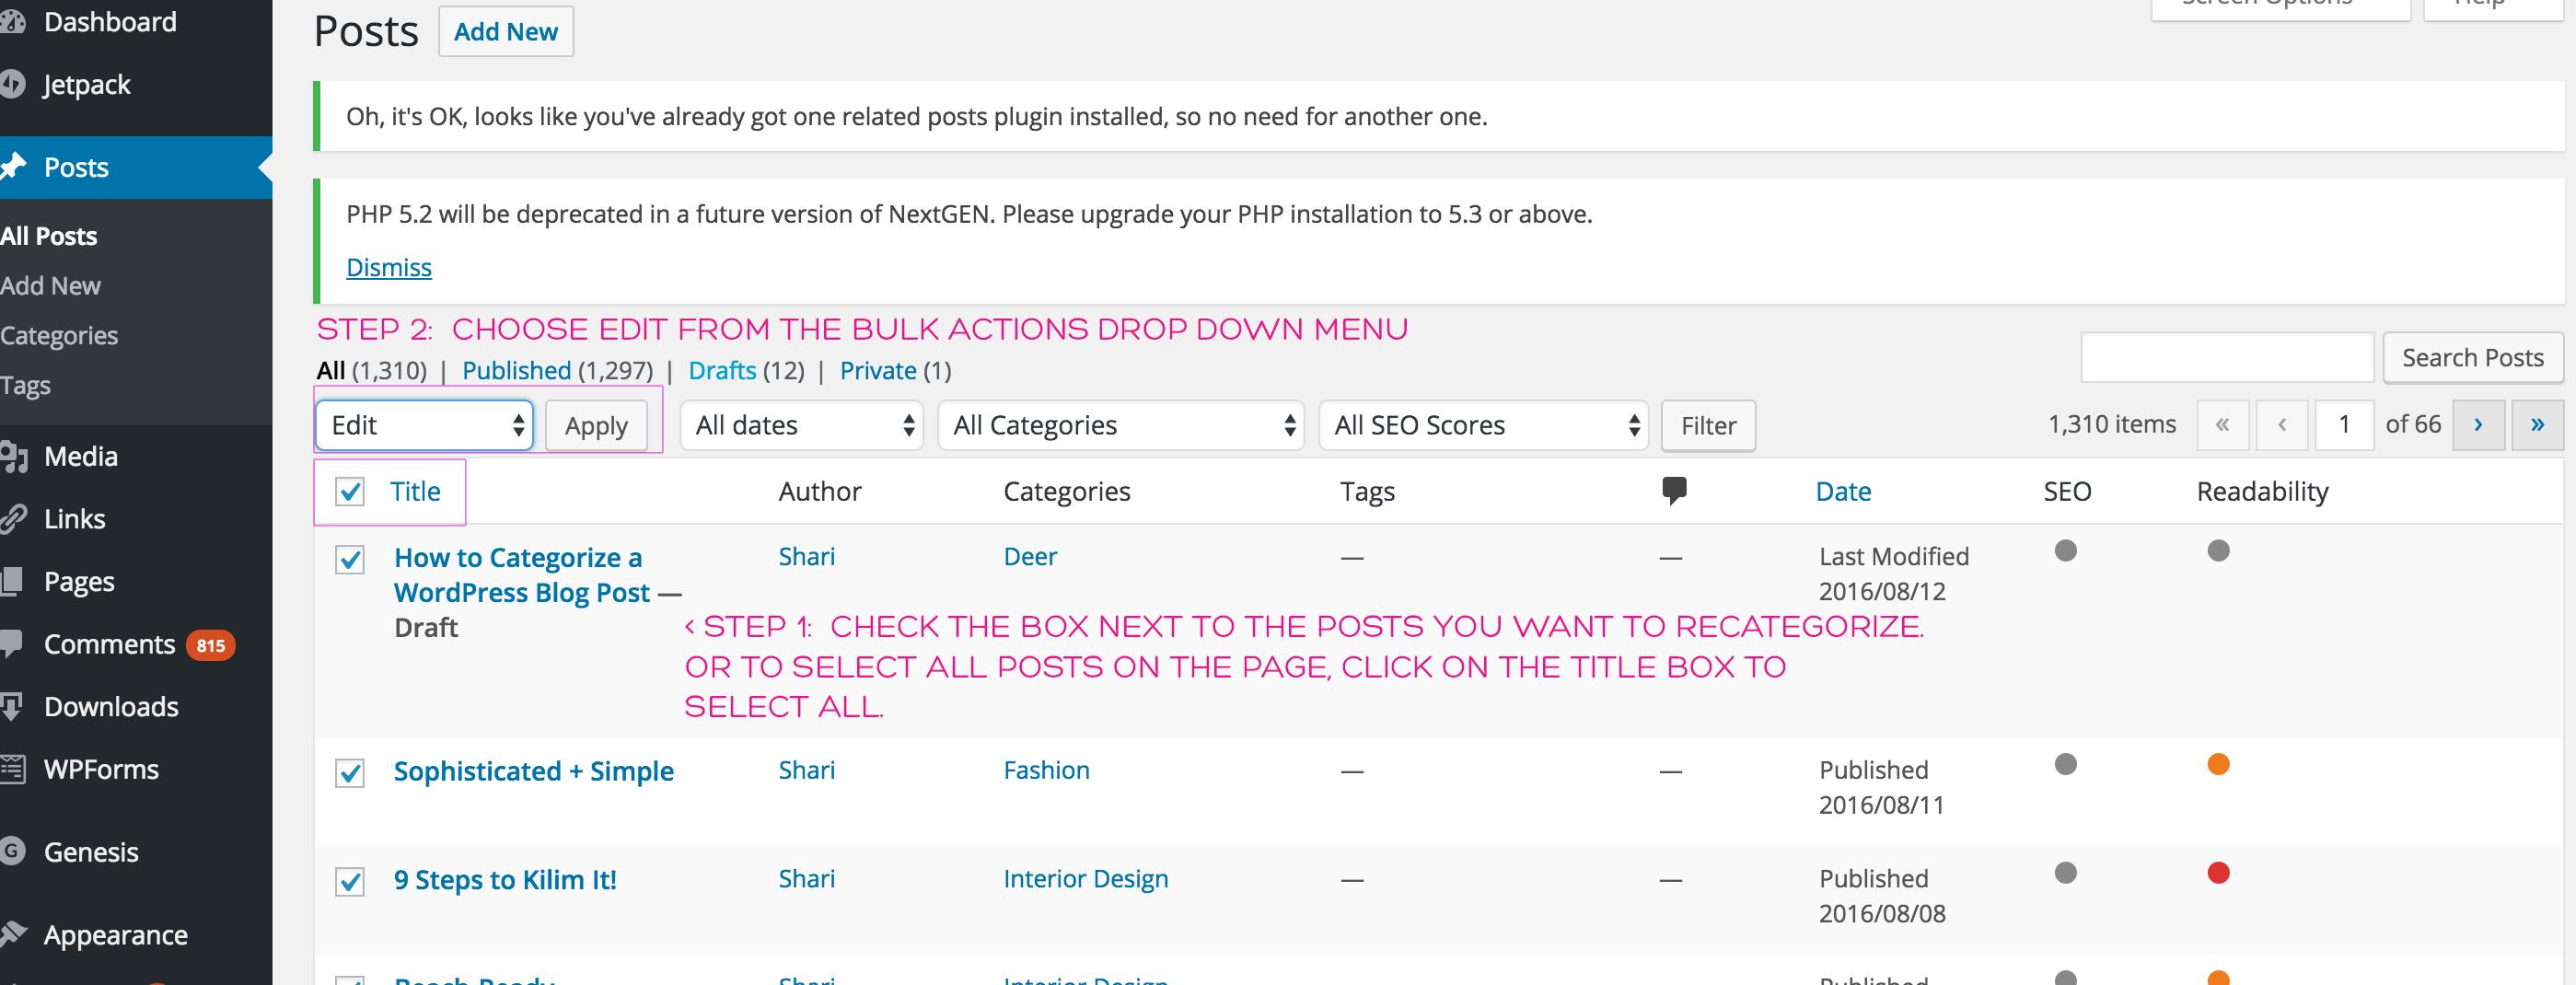 categorize posts screenshot 3